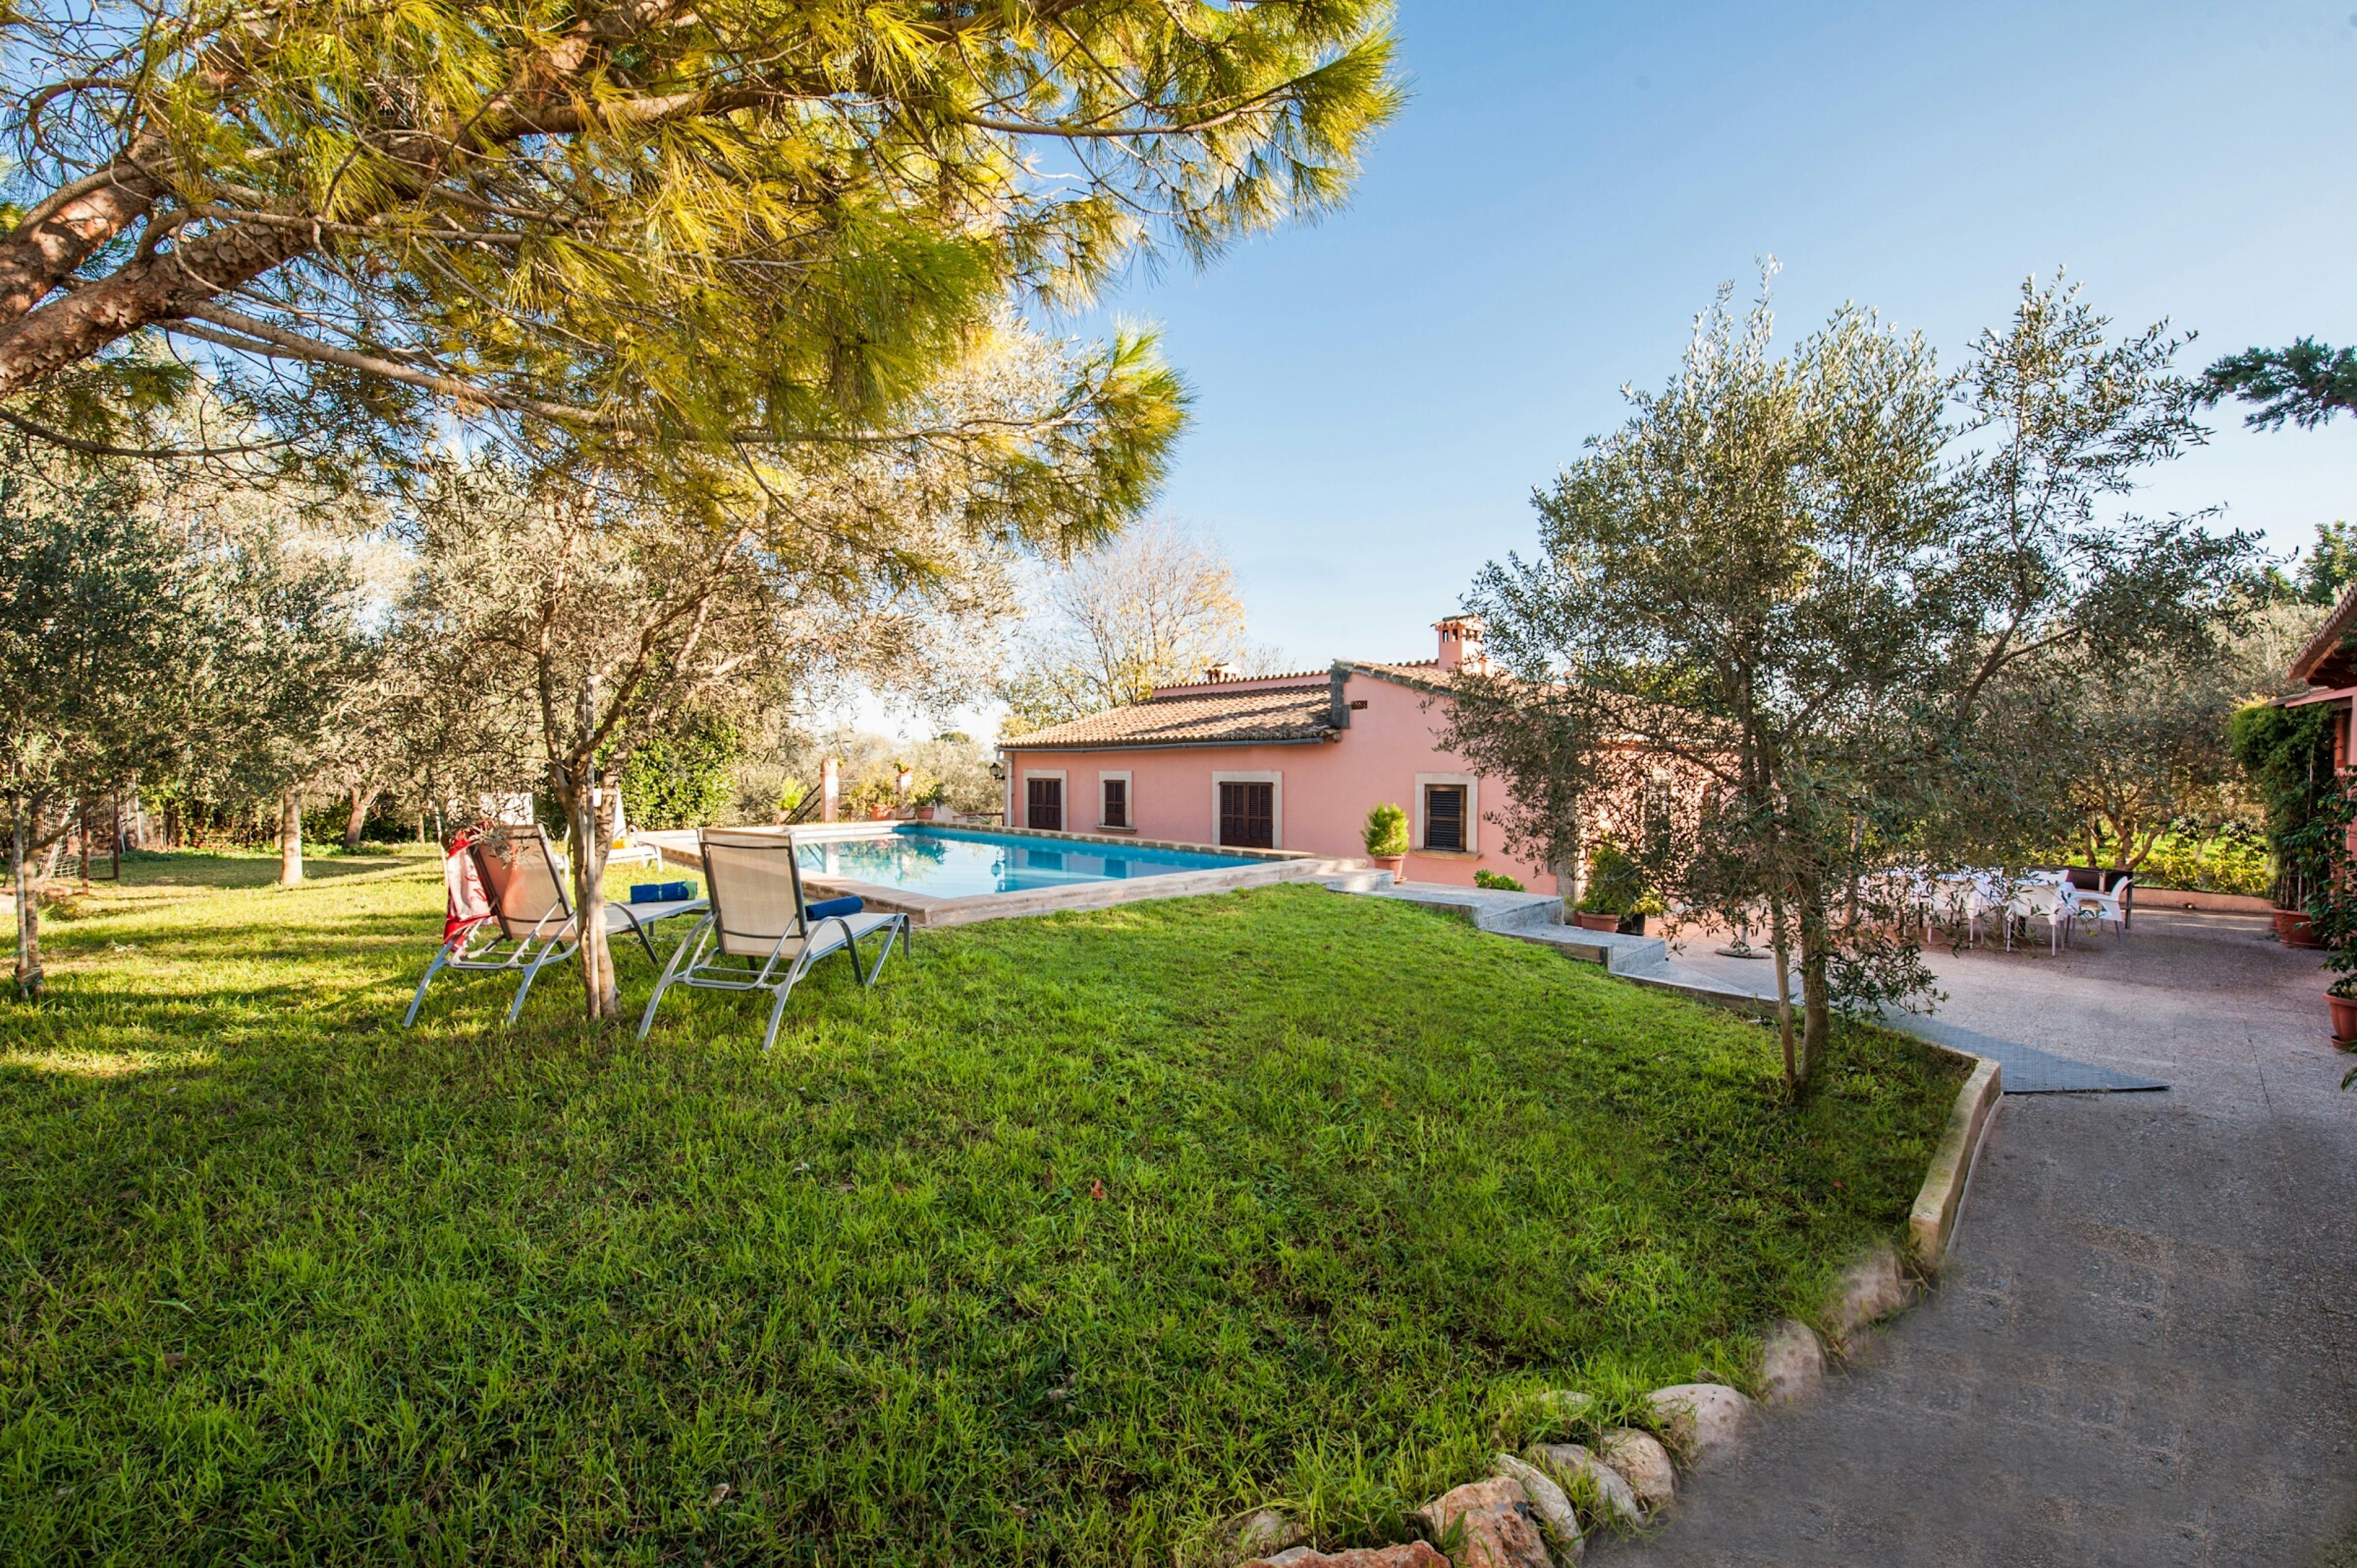 Maison de vacances CA'N LLUC- Alaró- MALLORCA - Kostenloses WLAN (2687507), Alaro, Majorque, Iles Baléares, Espagne, image 9